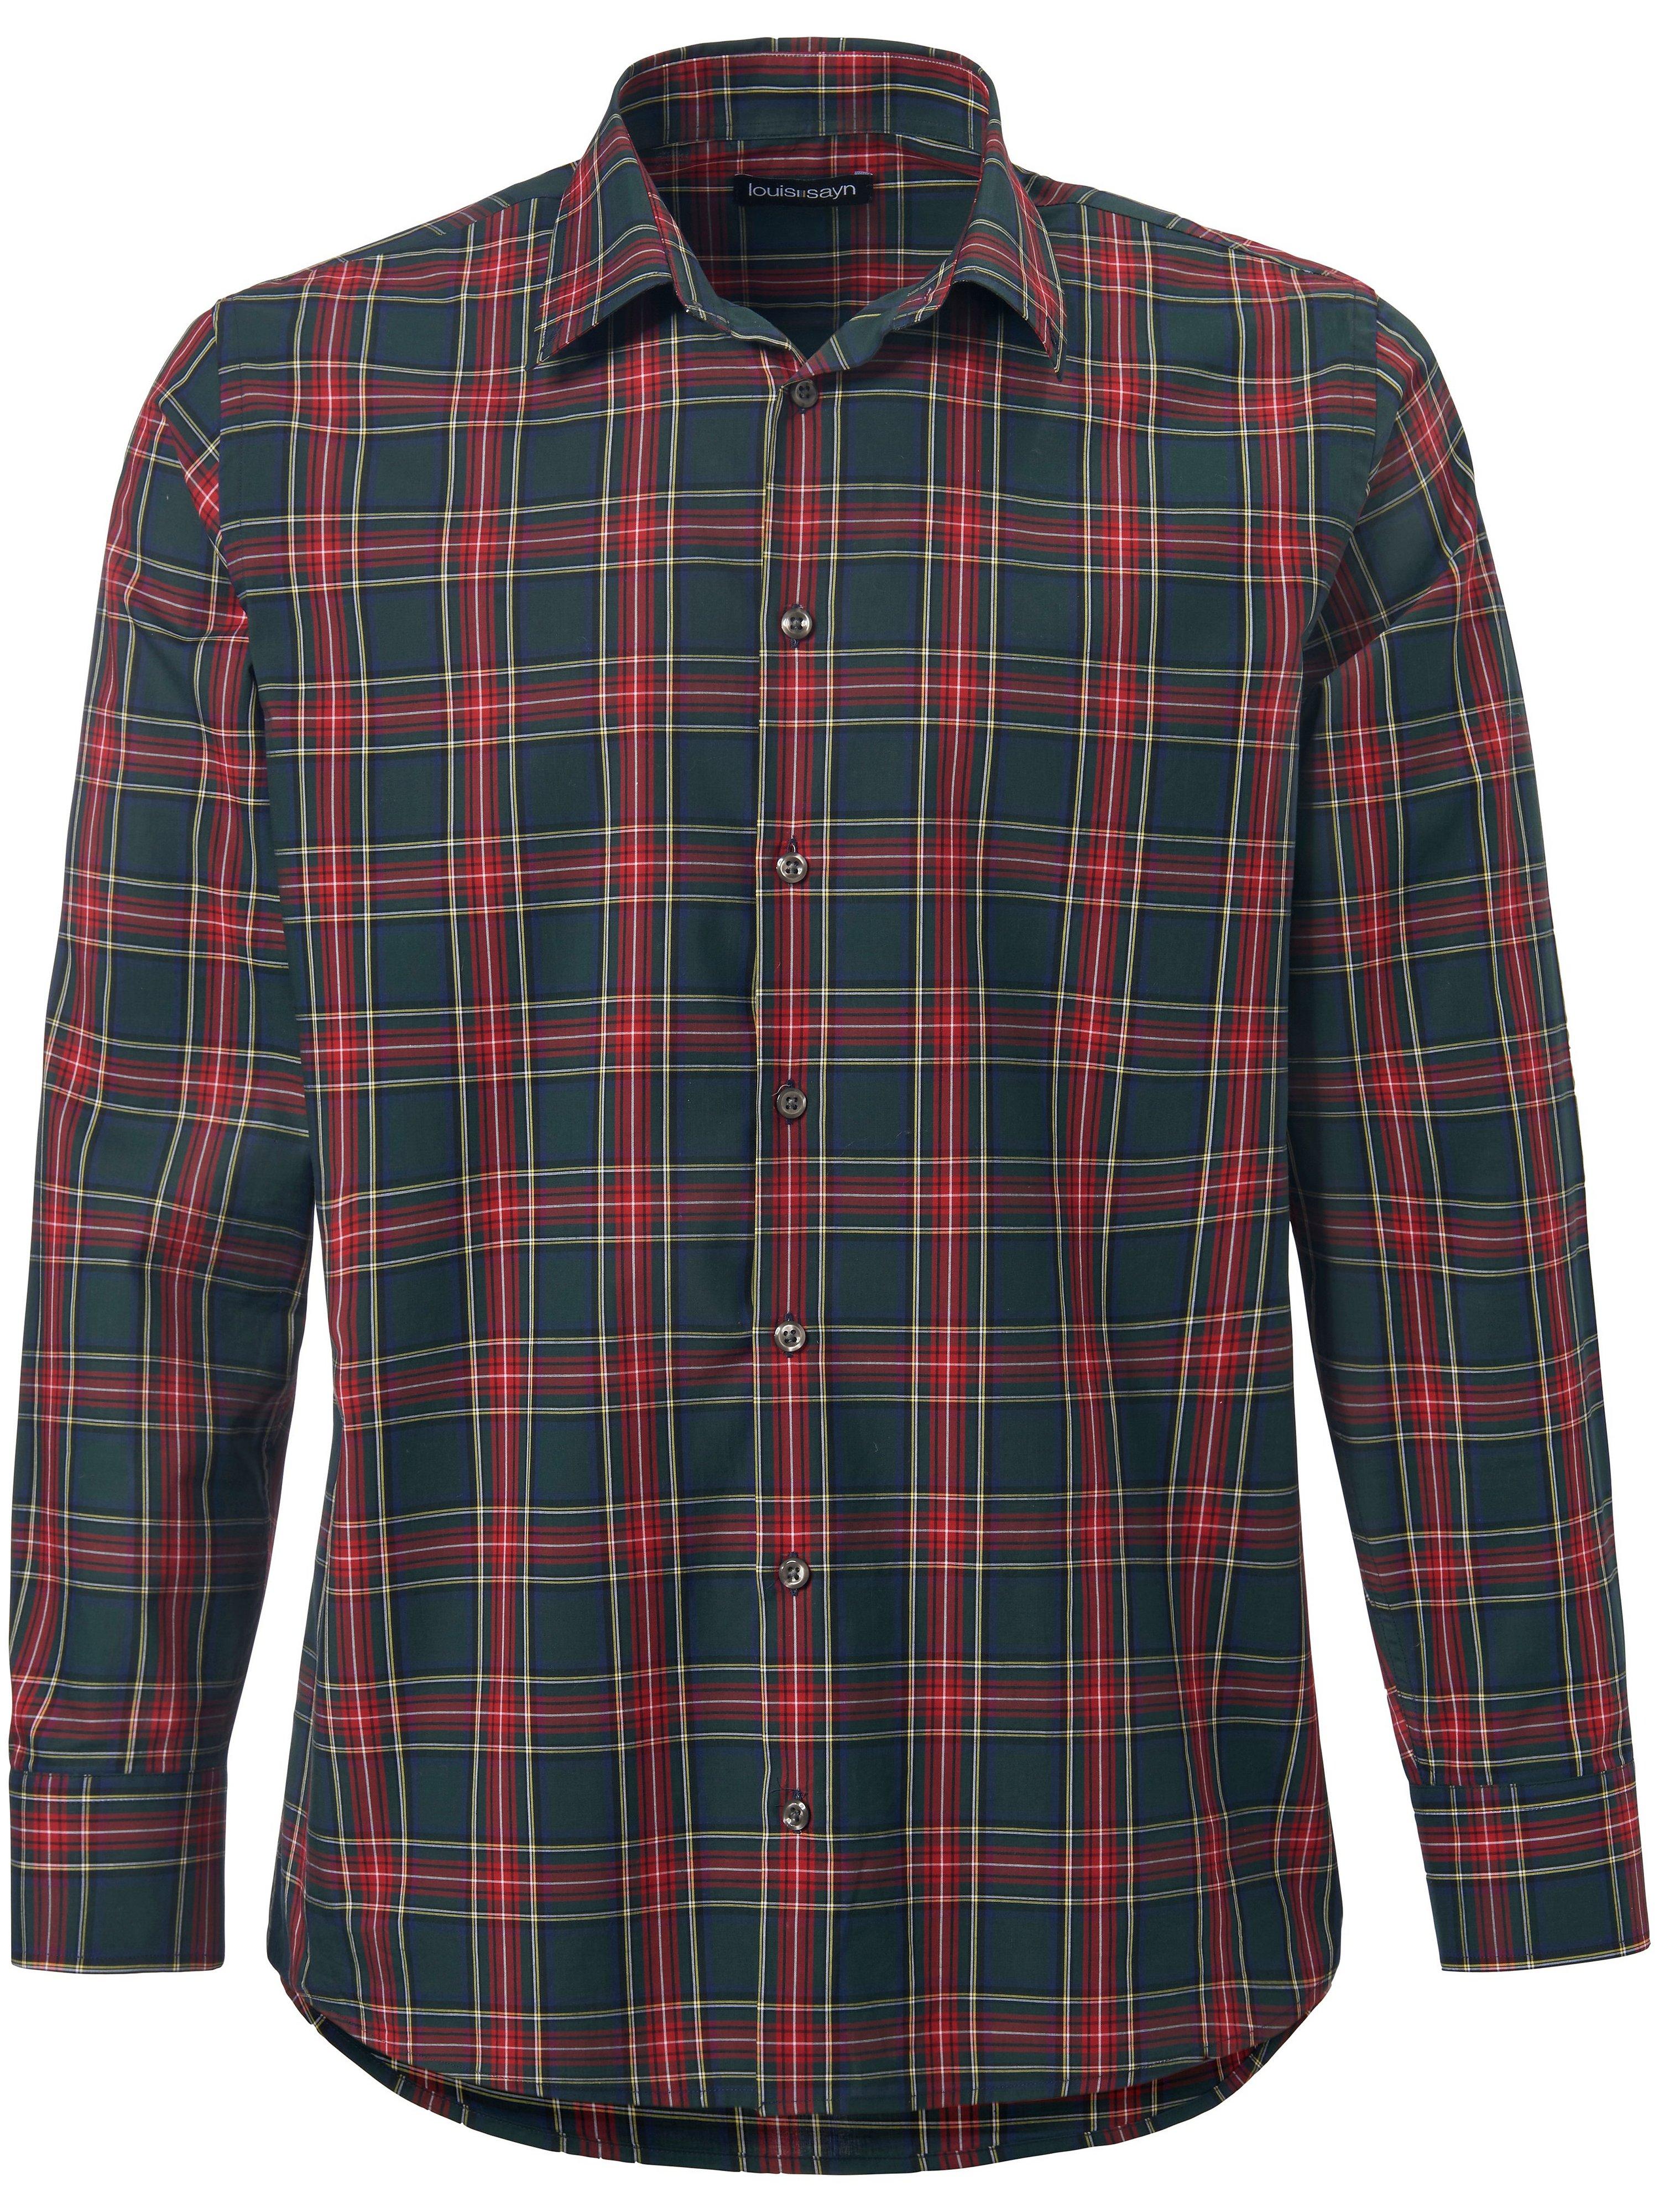 Overhemd 100% katoen Van Louis Sayn groen